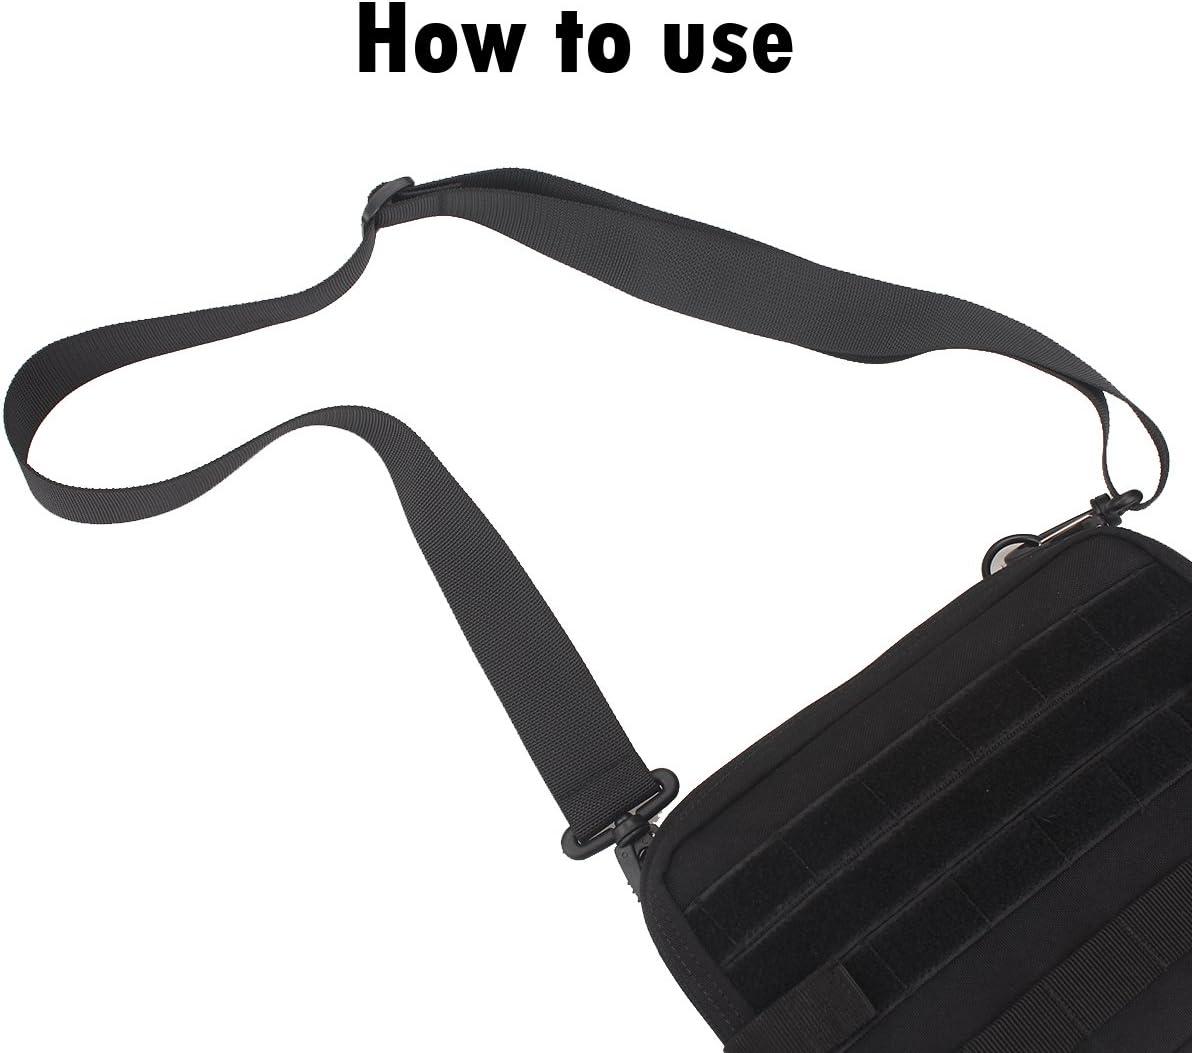 XTACER 1.5 Shoulder Clips Strap with Shoulder Pad Backpack Accessory Strap Luggage Straps Long Bag Strap